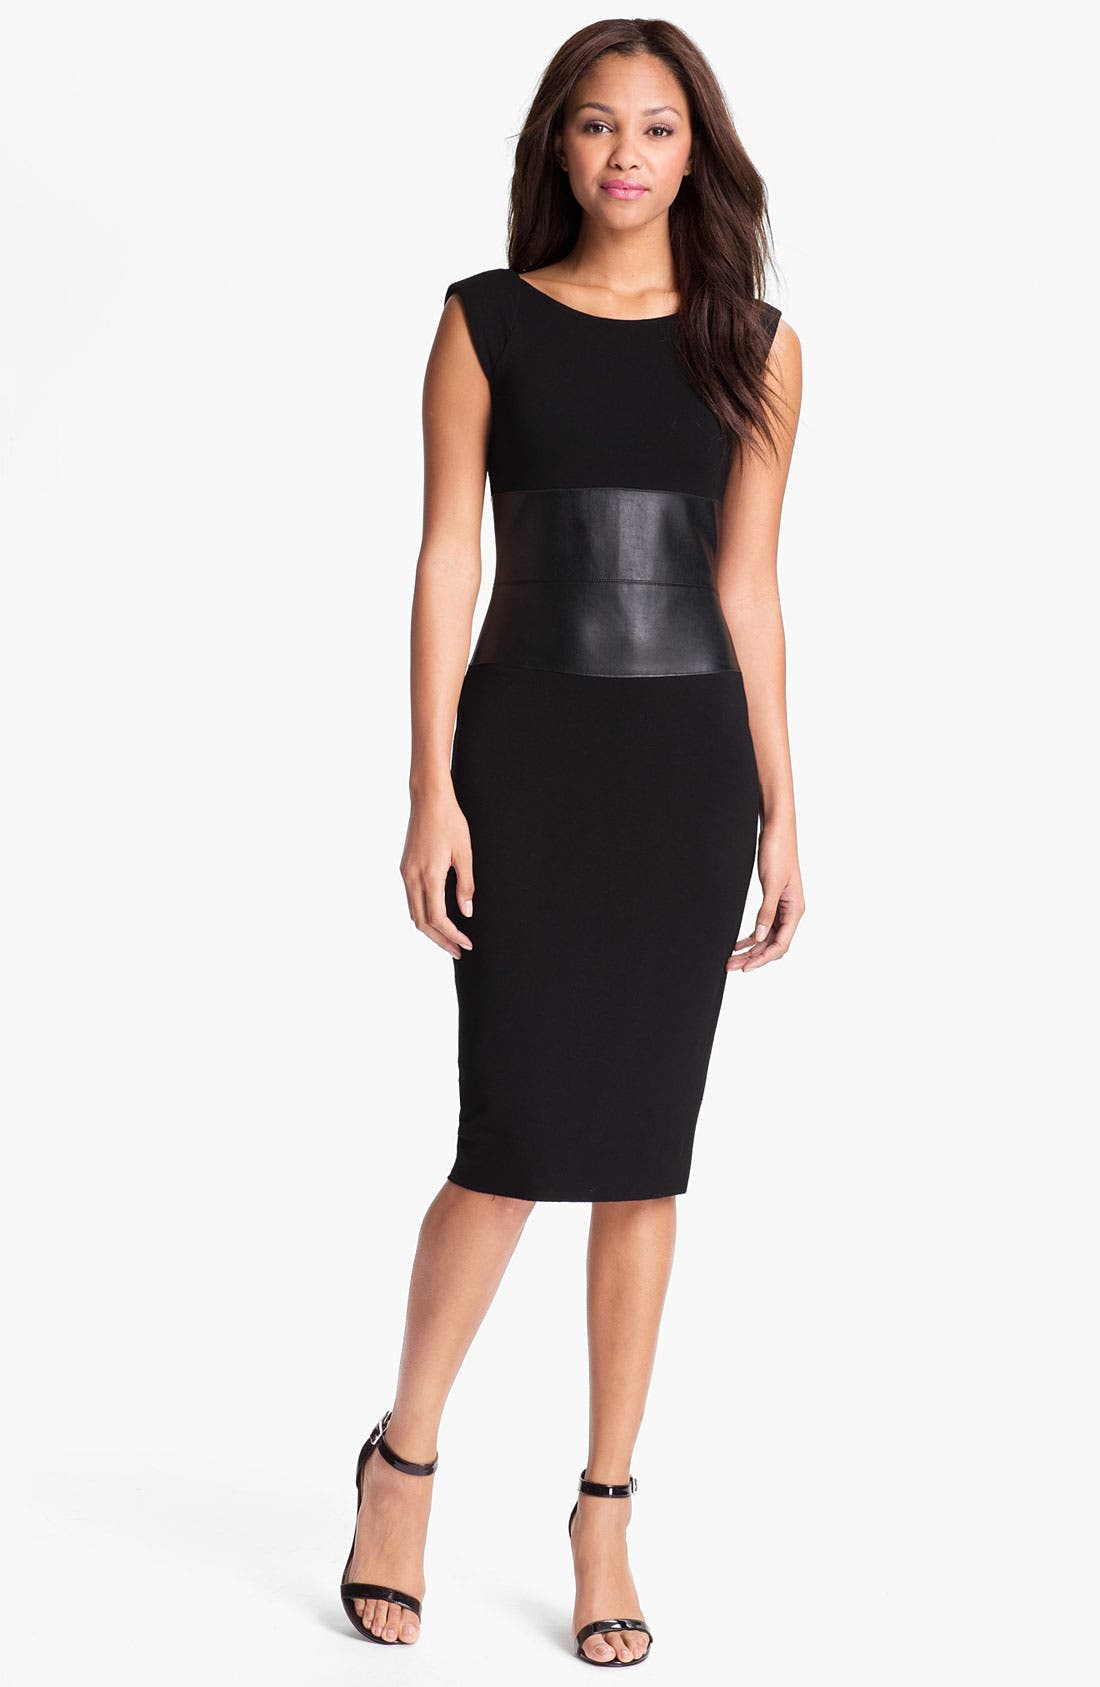 Main Image - B44 Dressed by Bailey 44 'Aerodynamic' Pencil Dress